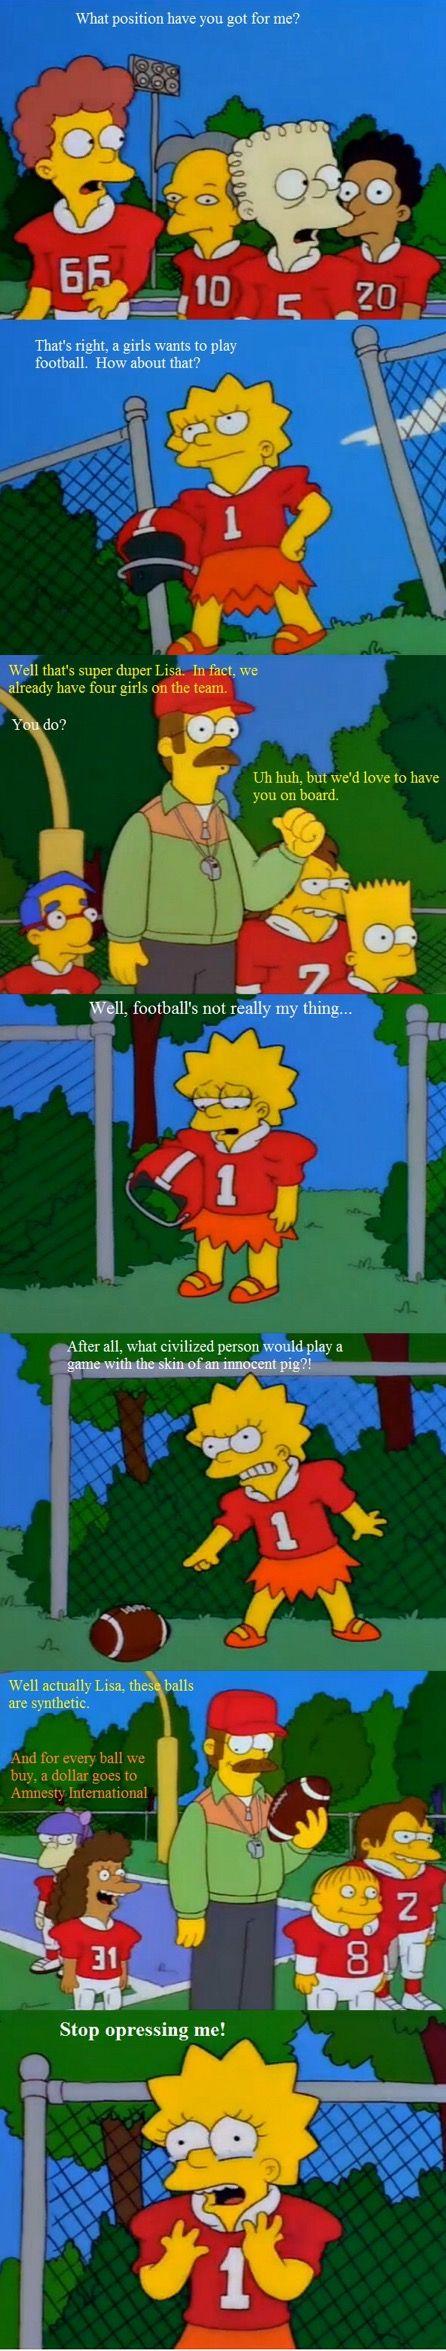 Oh Lisa...